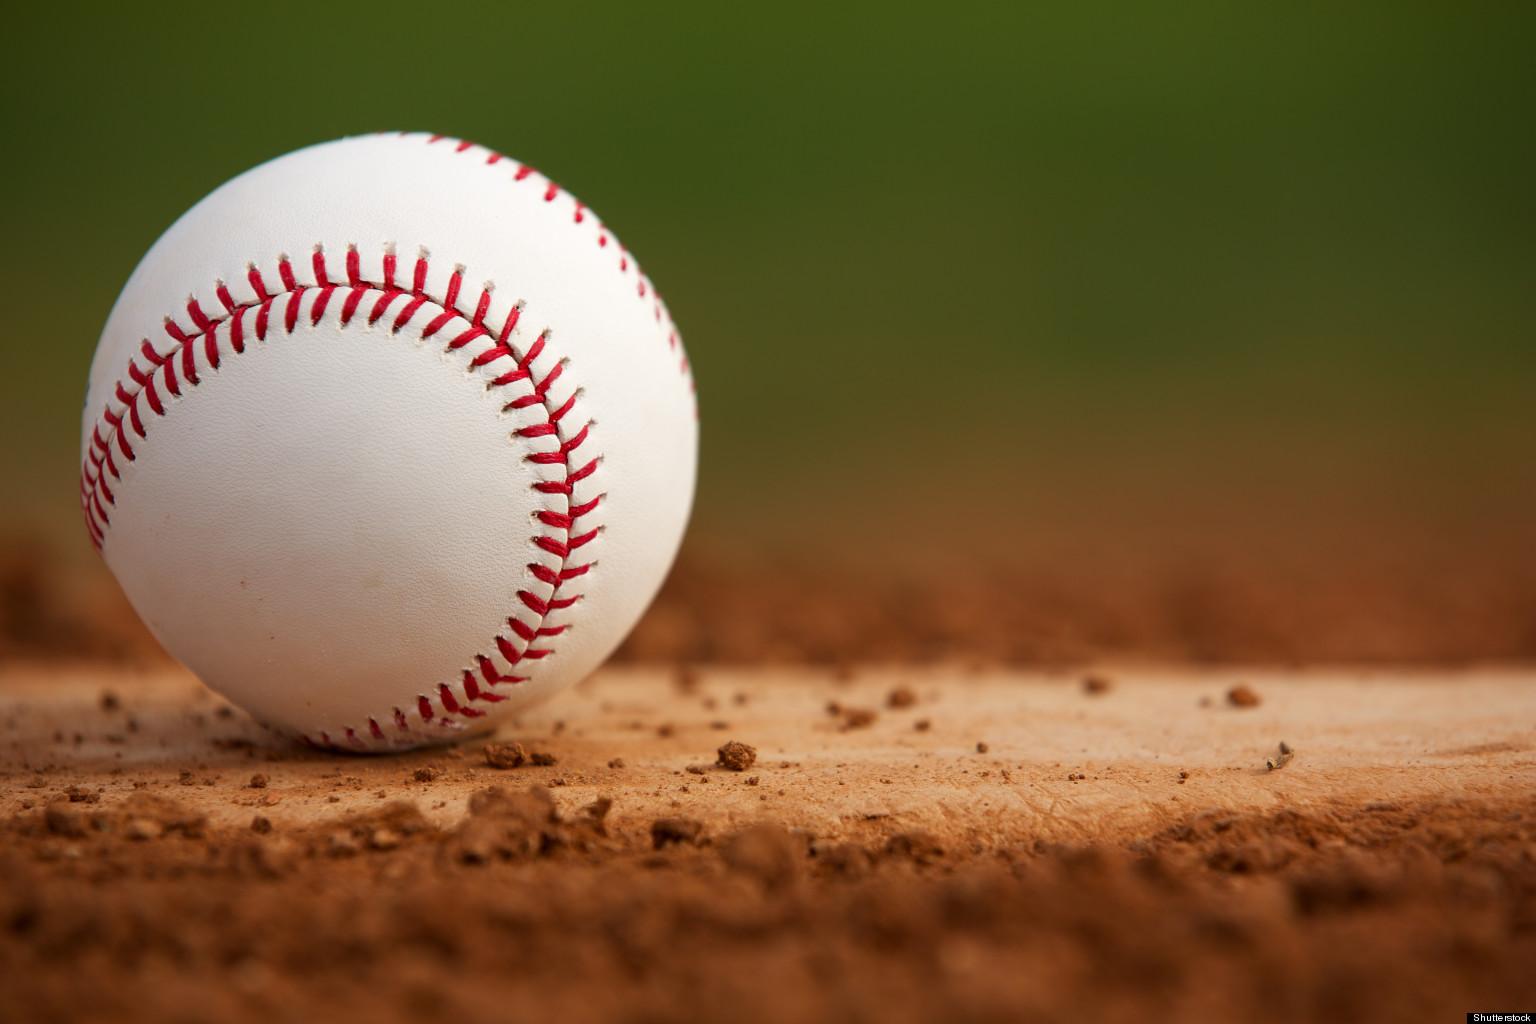 Baseball Still Trails on Diversity | The Huffington Post